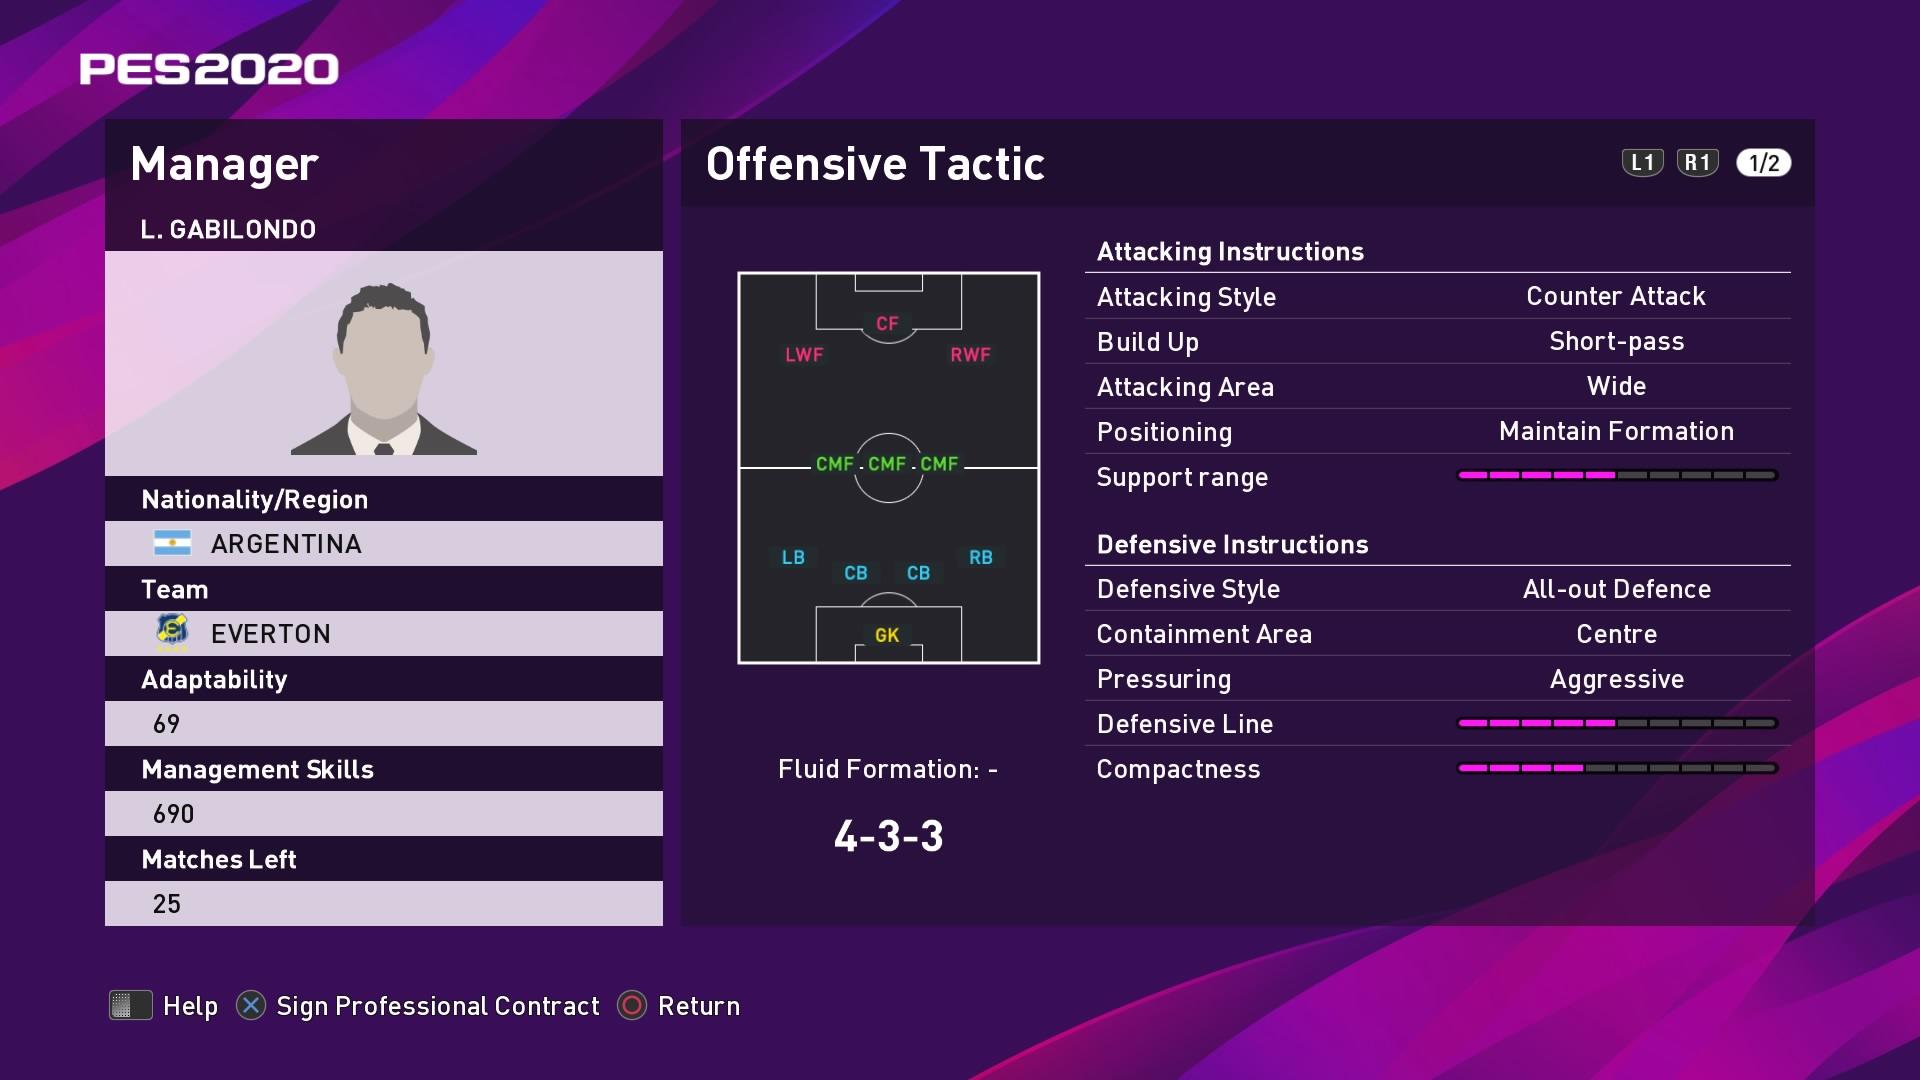 L. Gabilondo (javier Torrente) Offensive Tactic in PES 2020 myClub